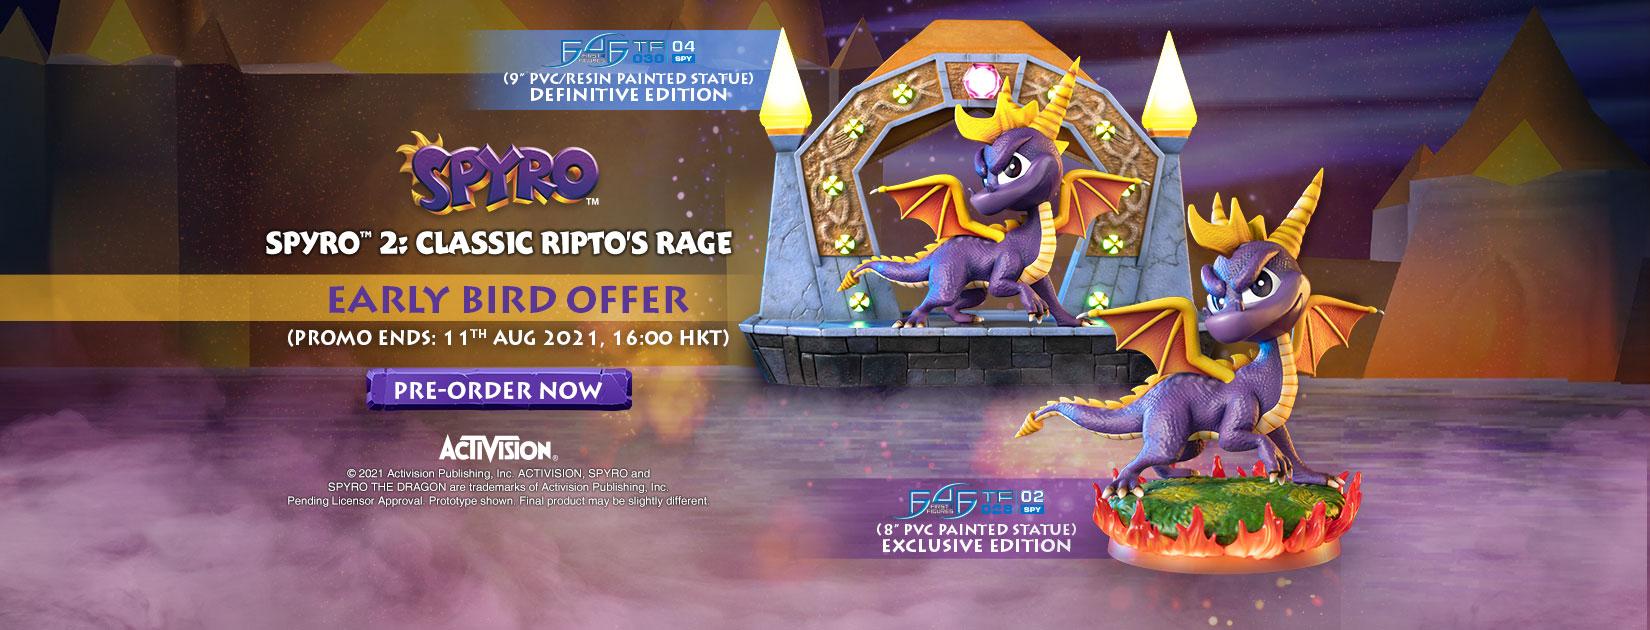 Spyro™ 2: Classic Ripto's Rage PVC statue Early Bird Offer